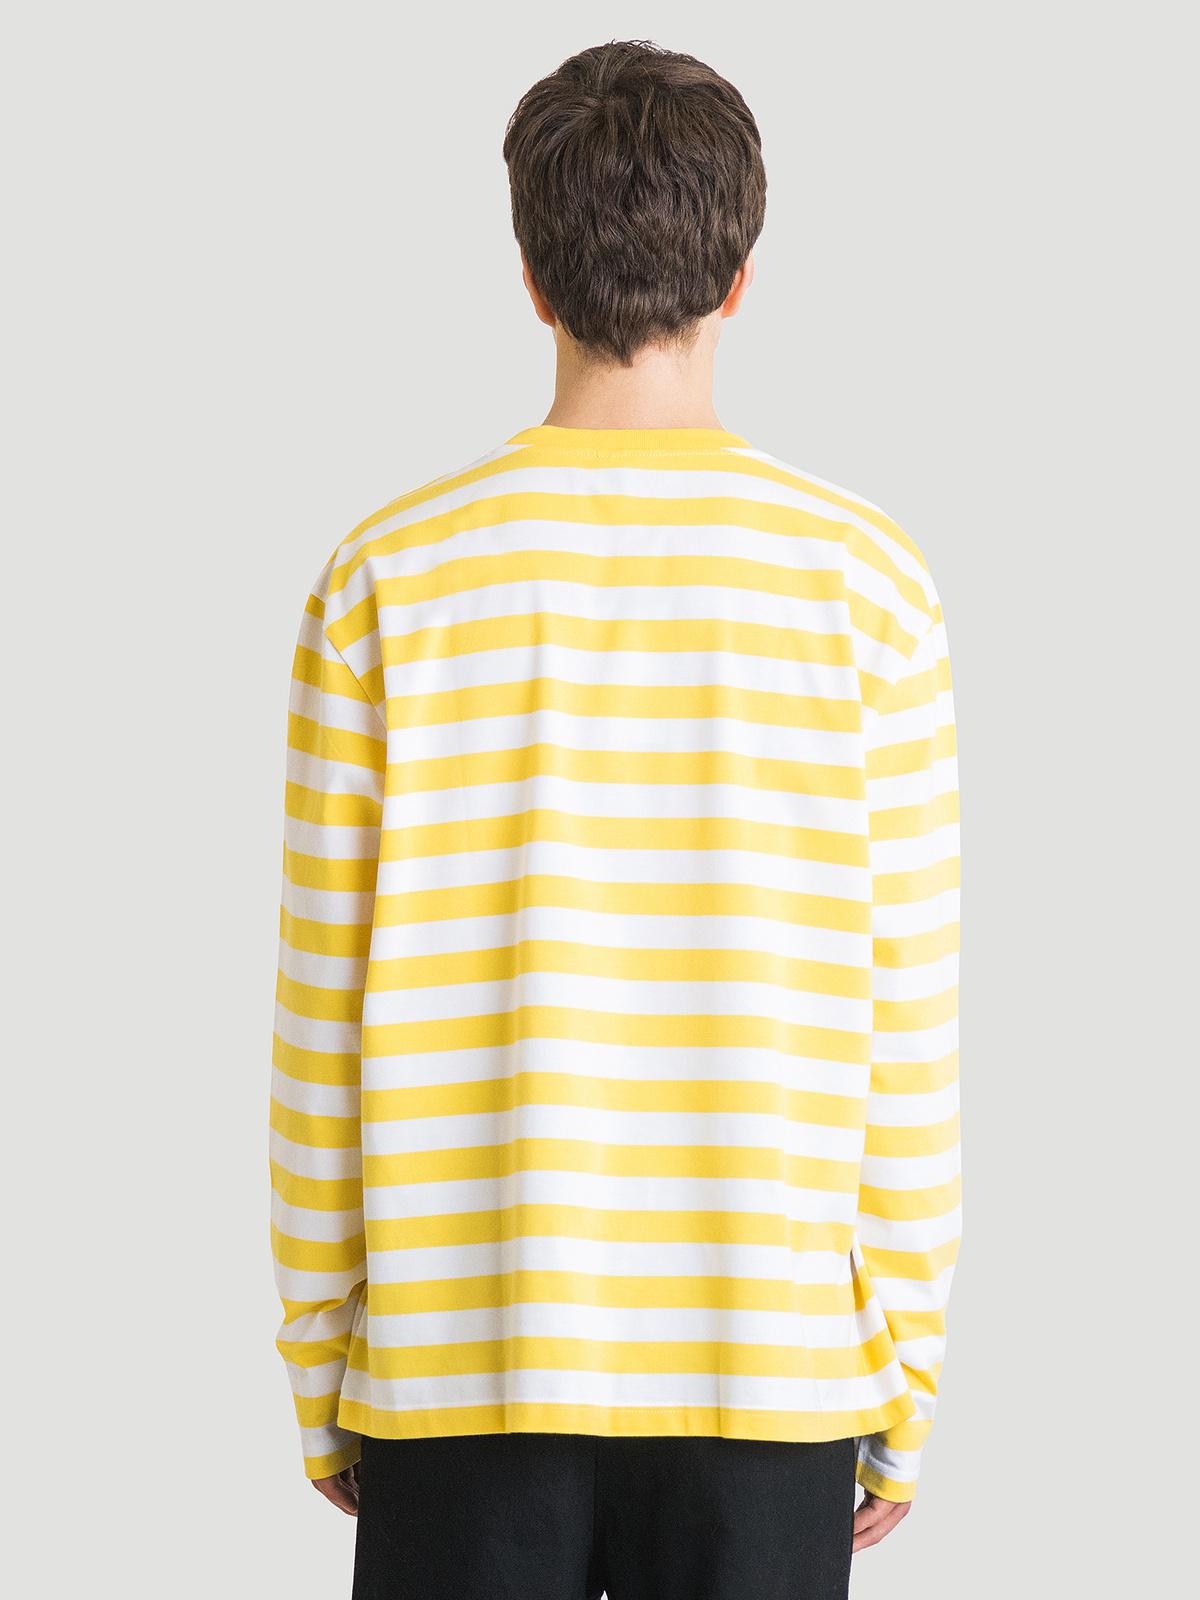 Hanger Striped Longsleeve Yellow White 5